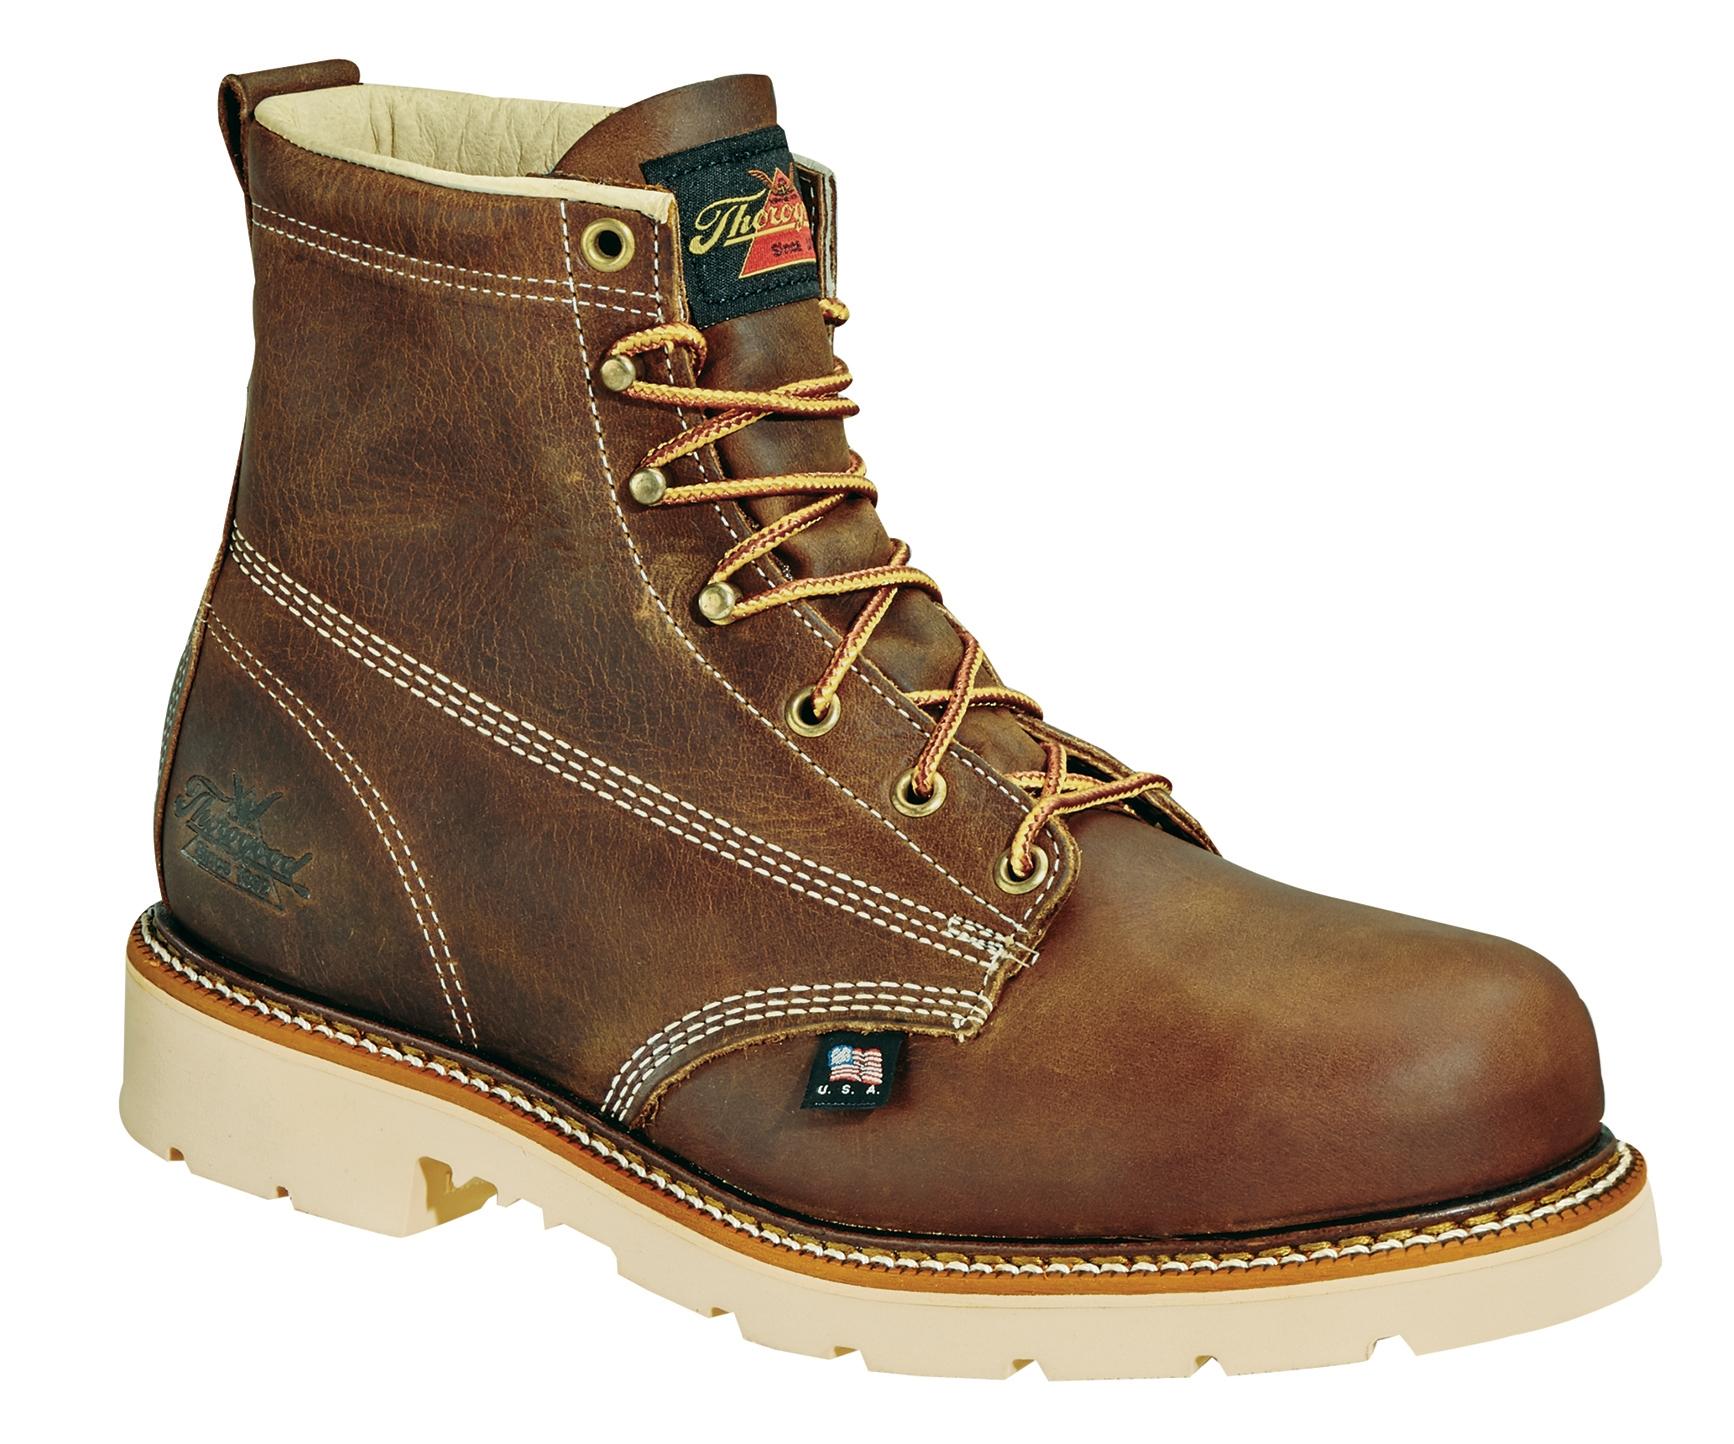 Thorogood American Heritage Plain-Toe Boots Thorogood American Heritage Plain-Toe Boots new foto